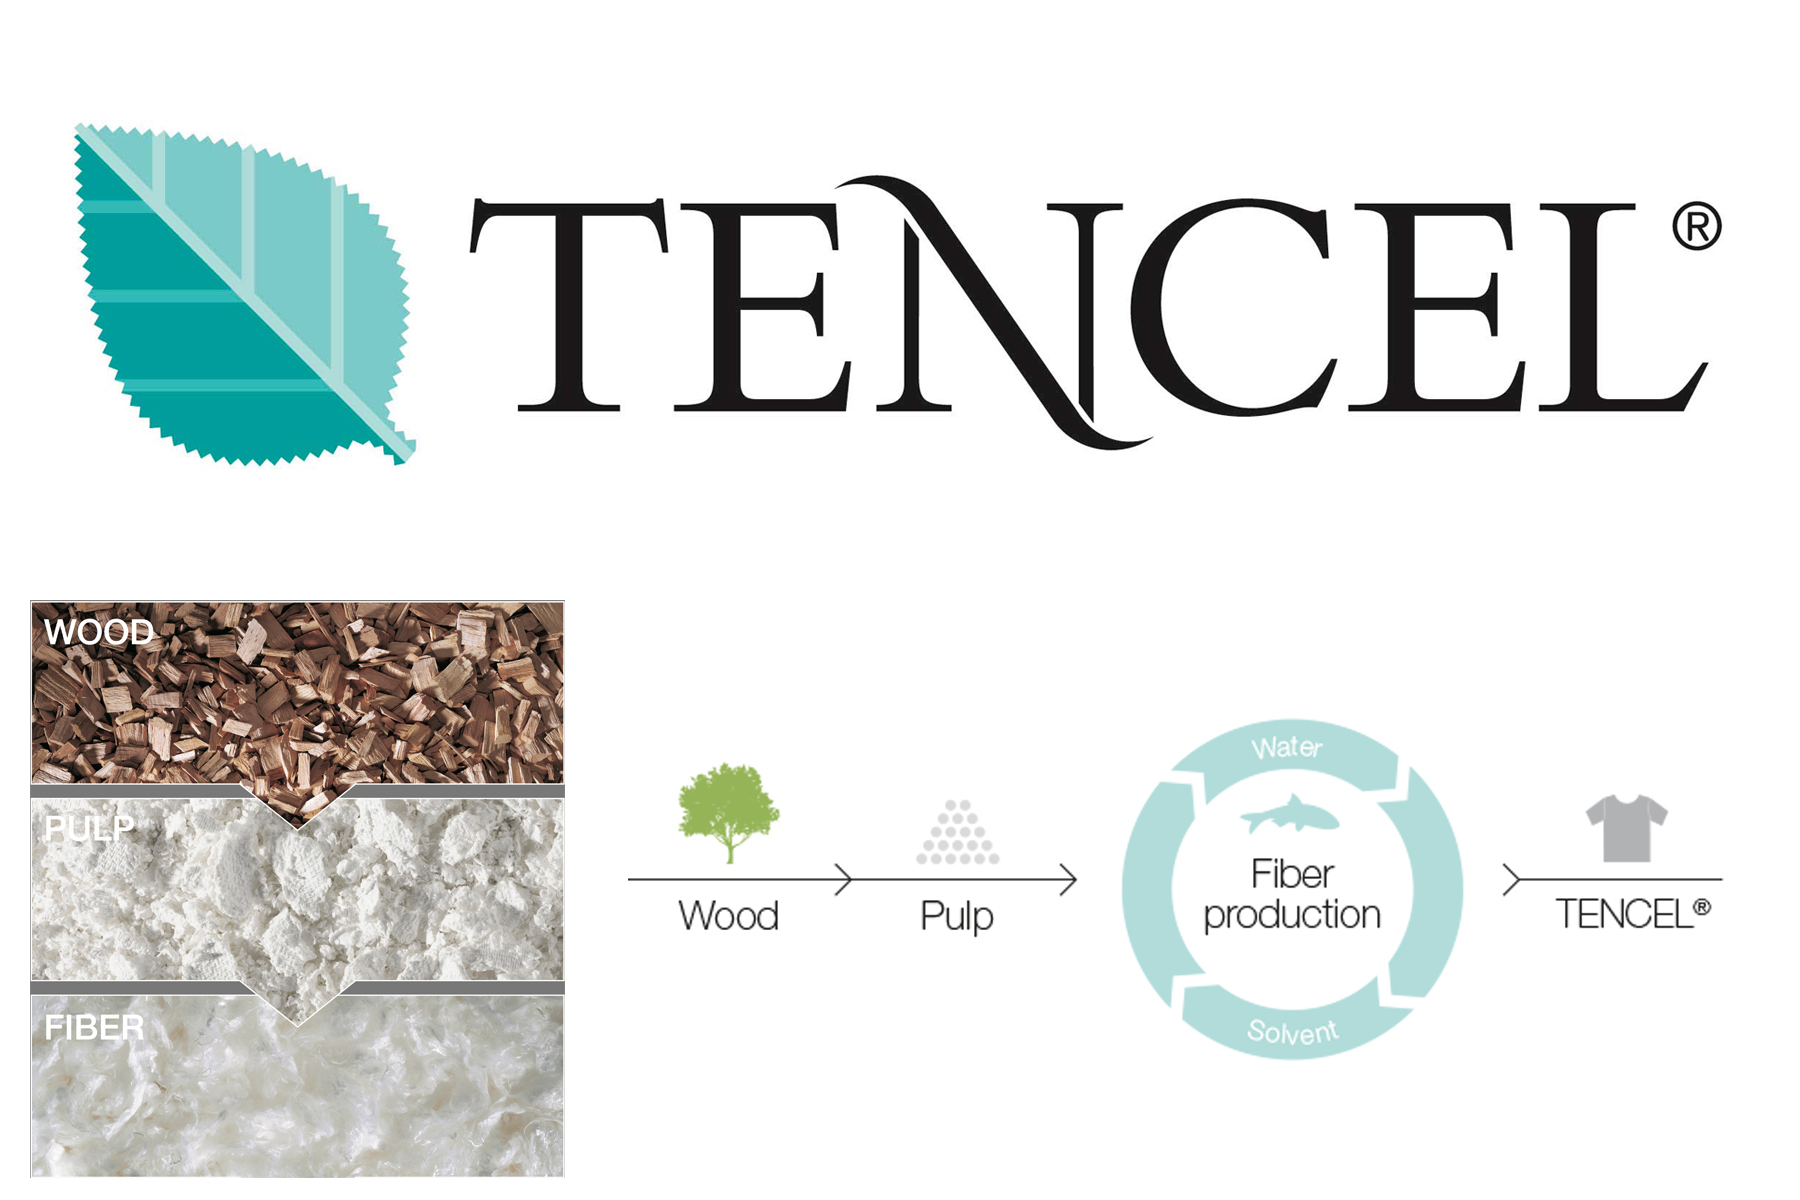 014 tencel Closed loop wood pulp fibre.jpg